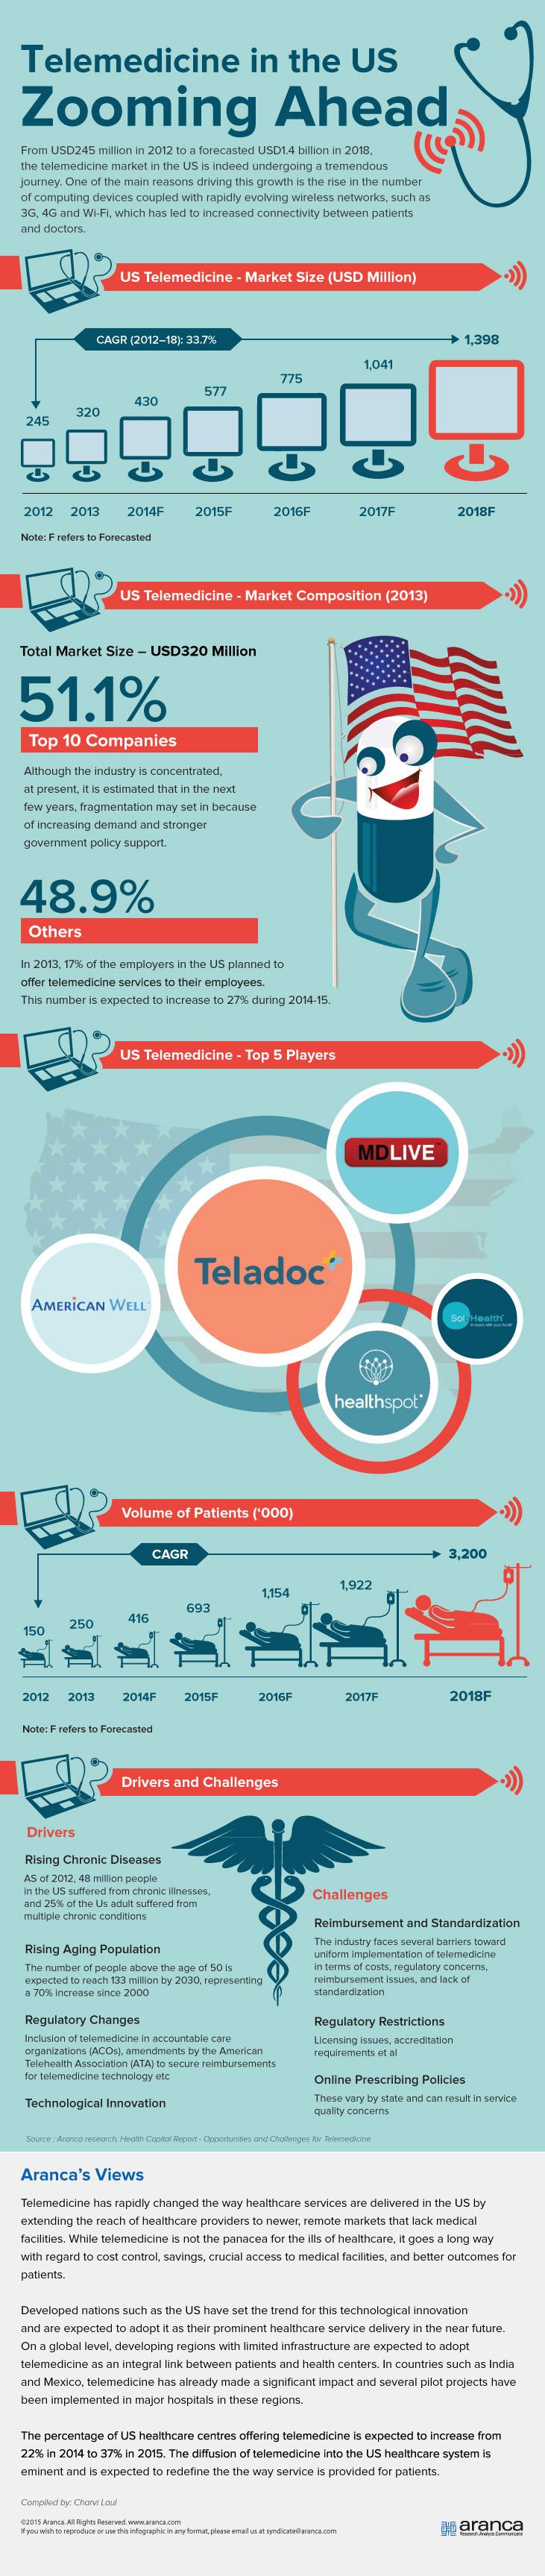 Telemedicine: The Medical Revolution